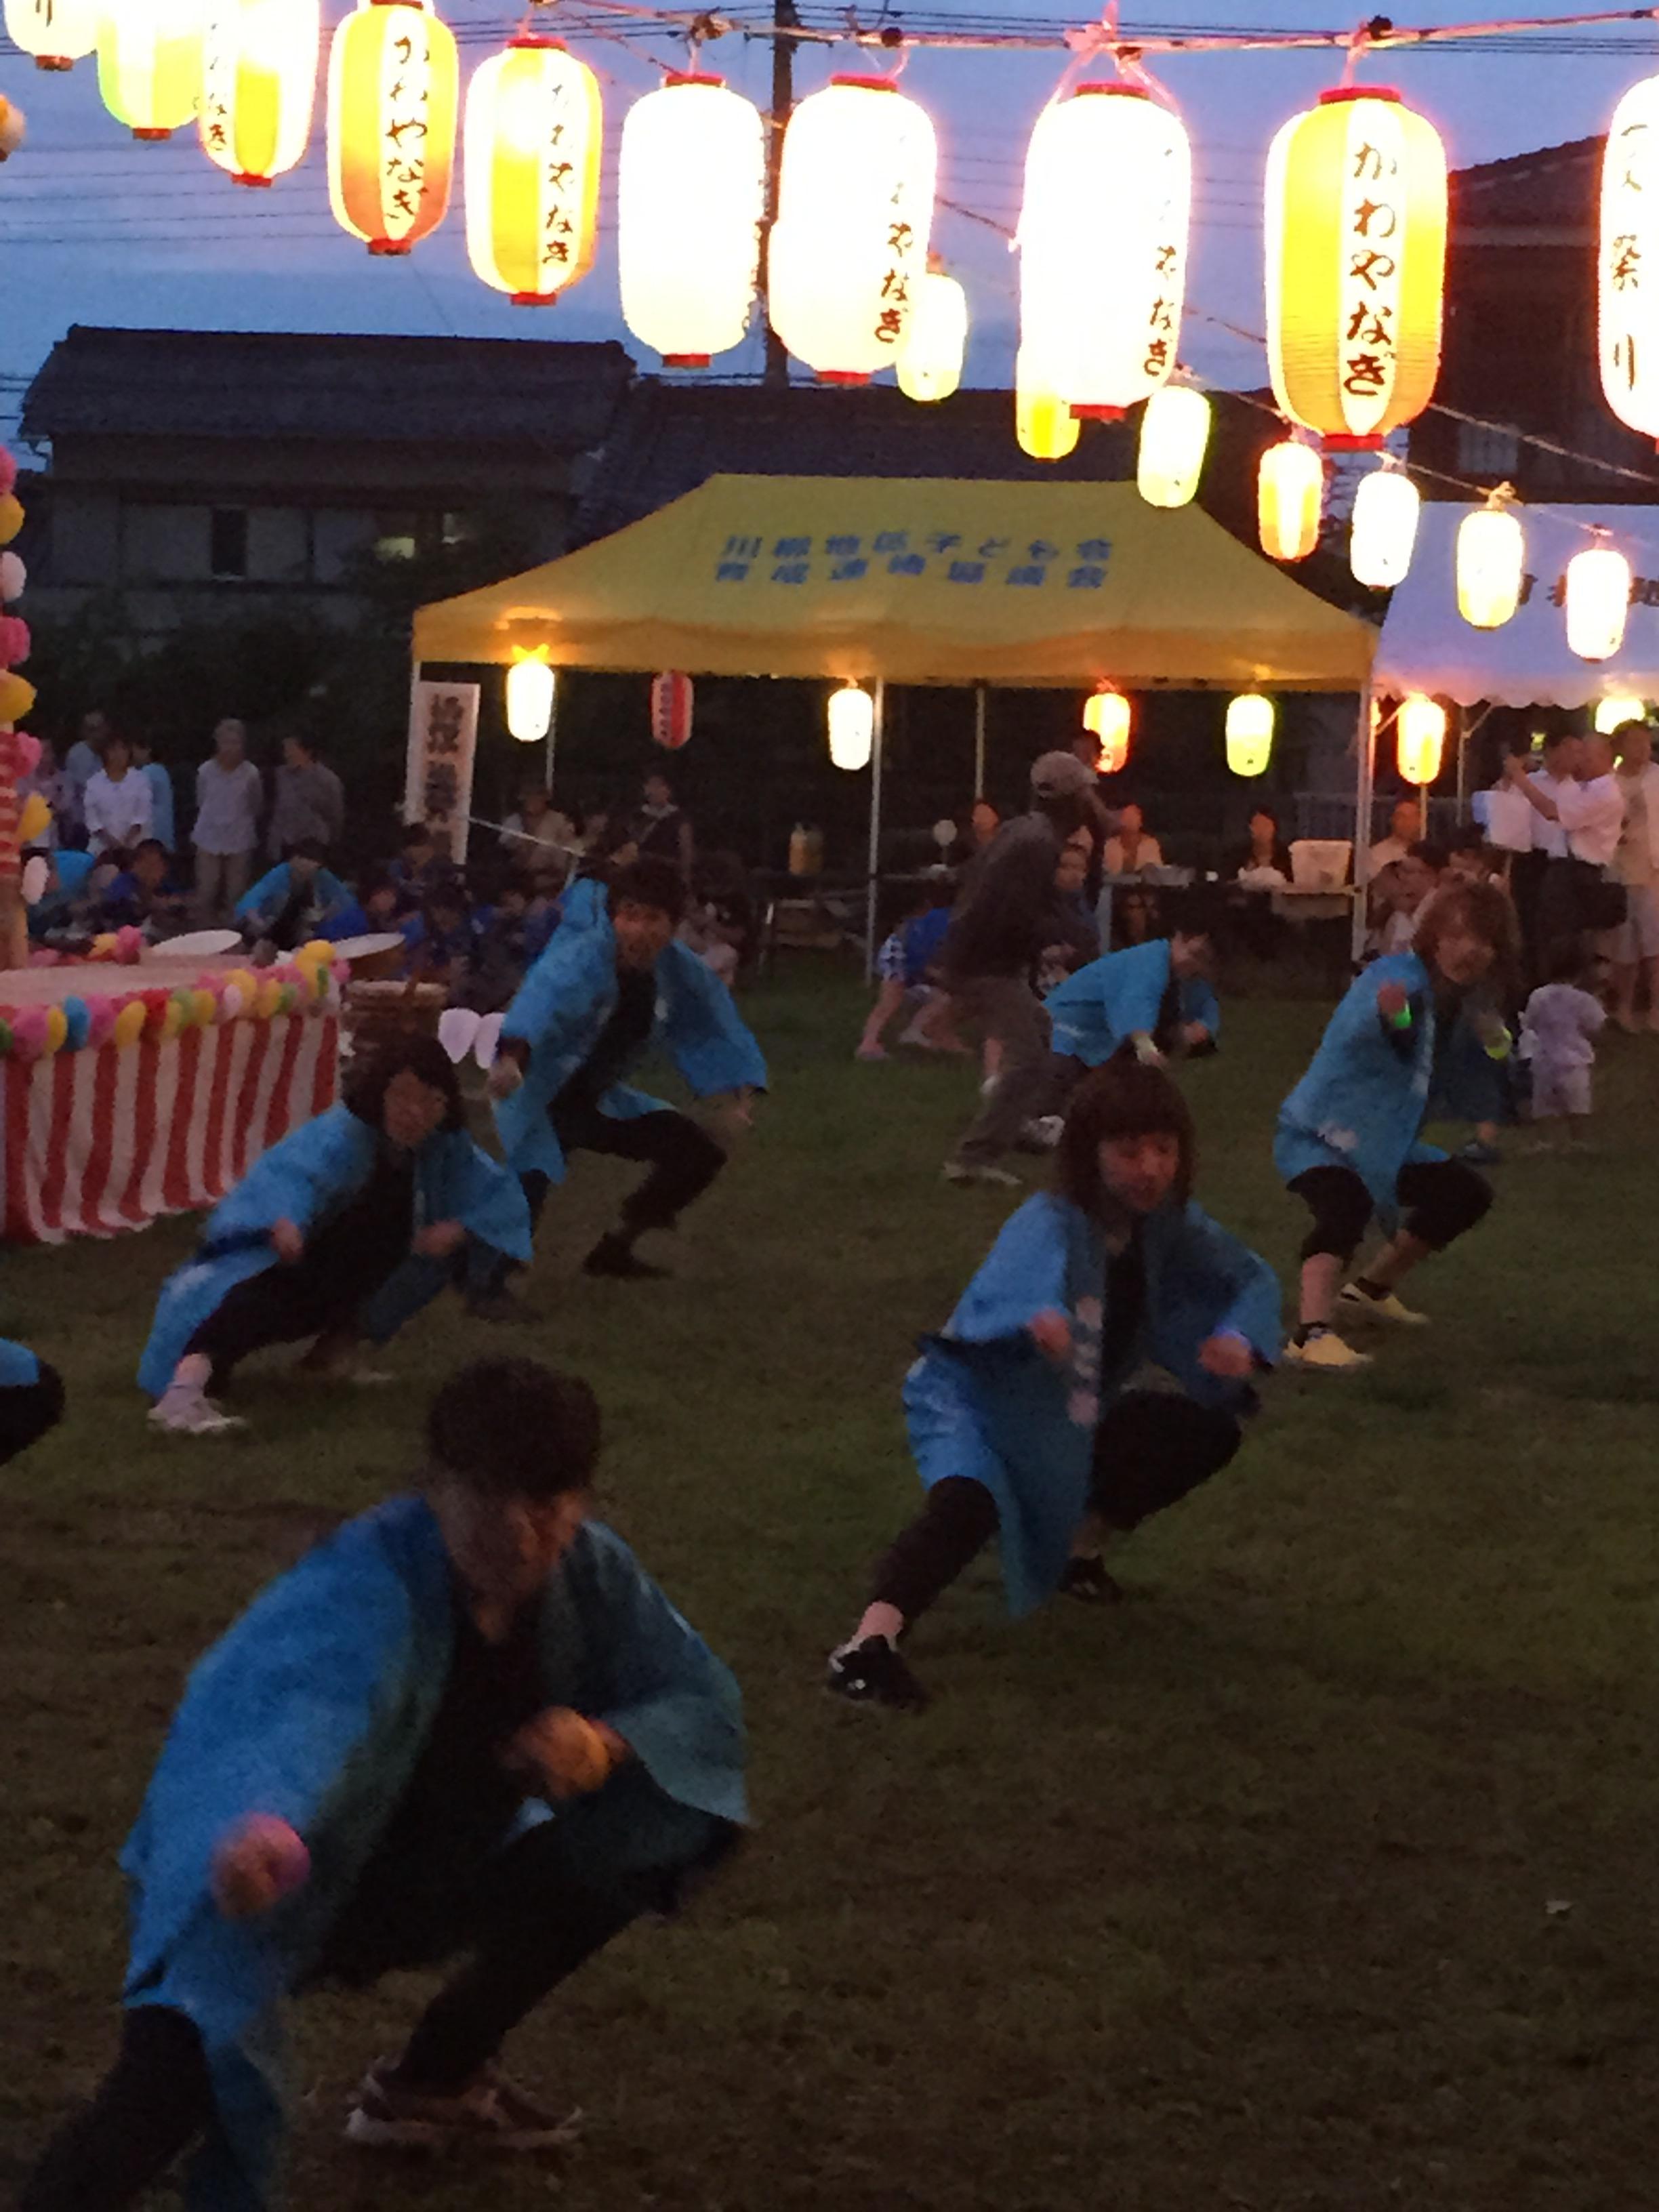 川柳夏祭り写真④